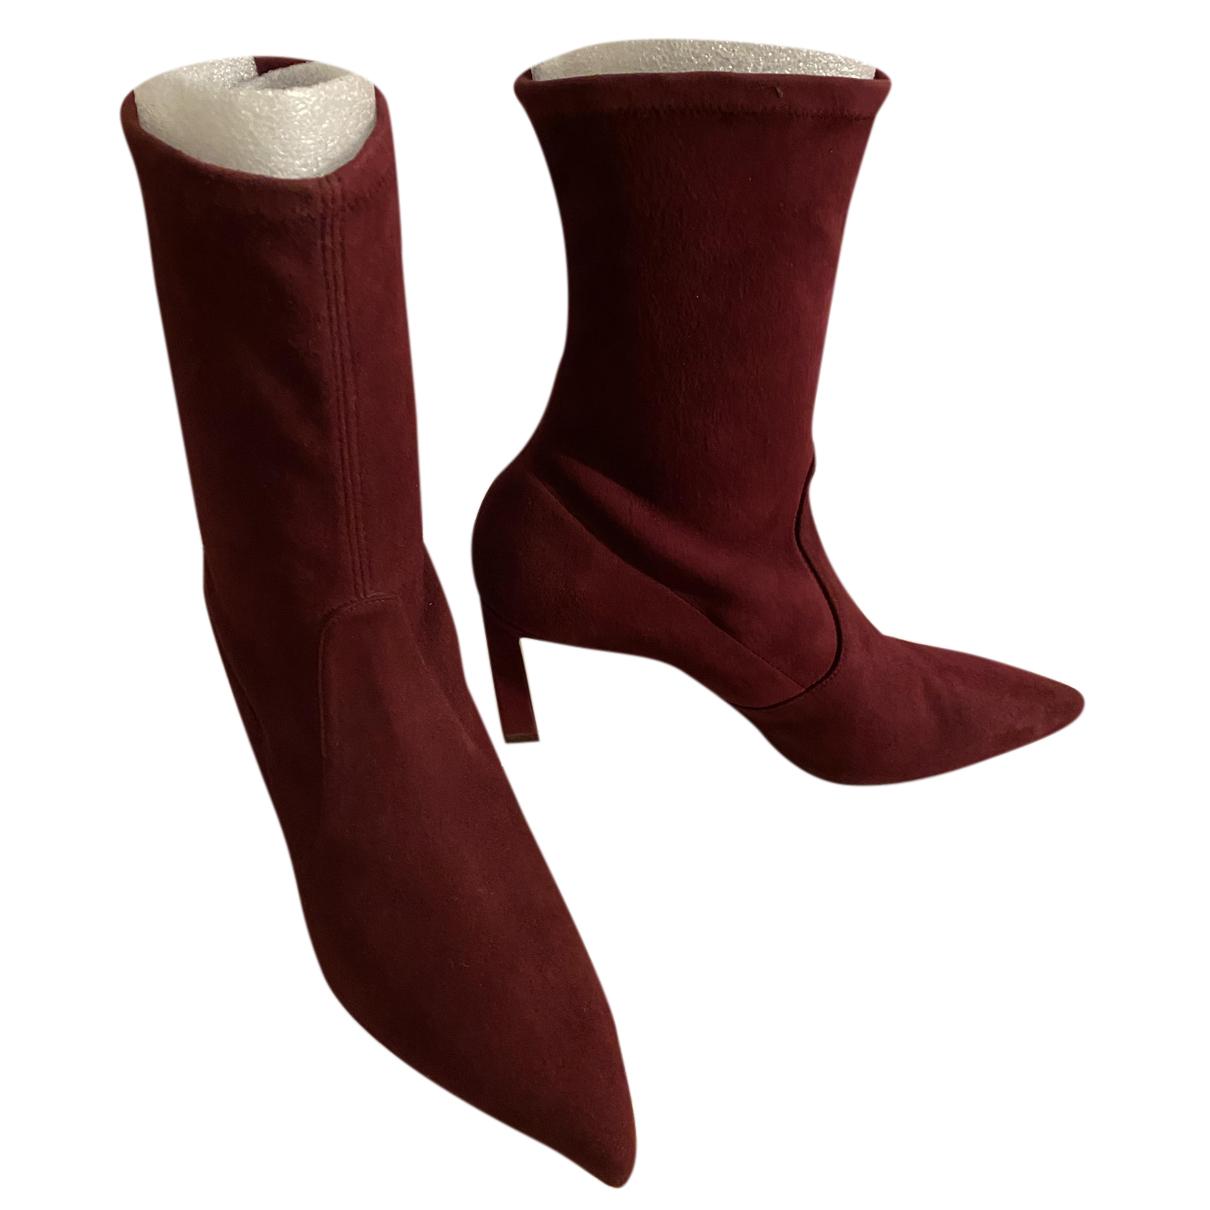 Stuart Weitzman N Burgundy Suede Boots for Women 9 US